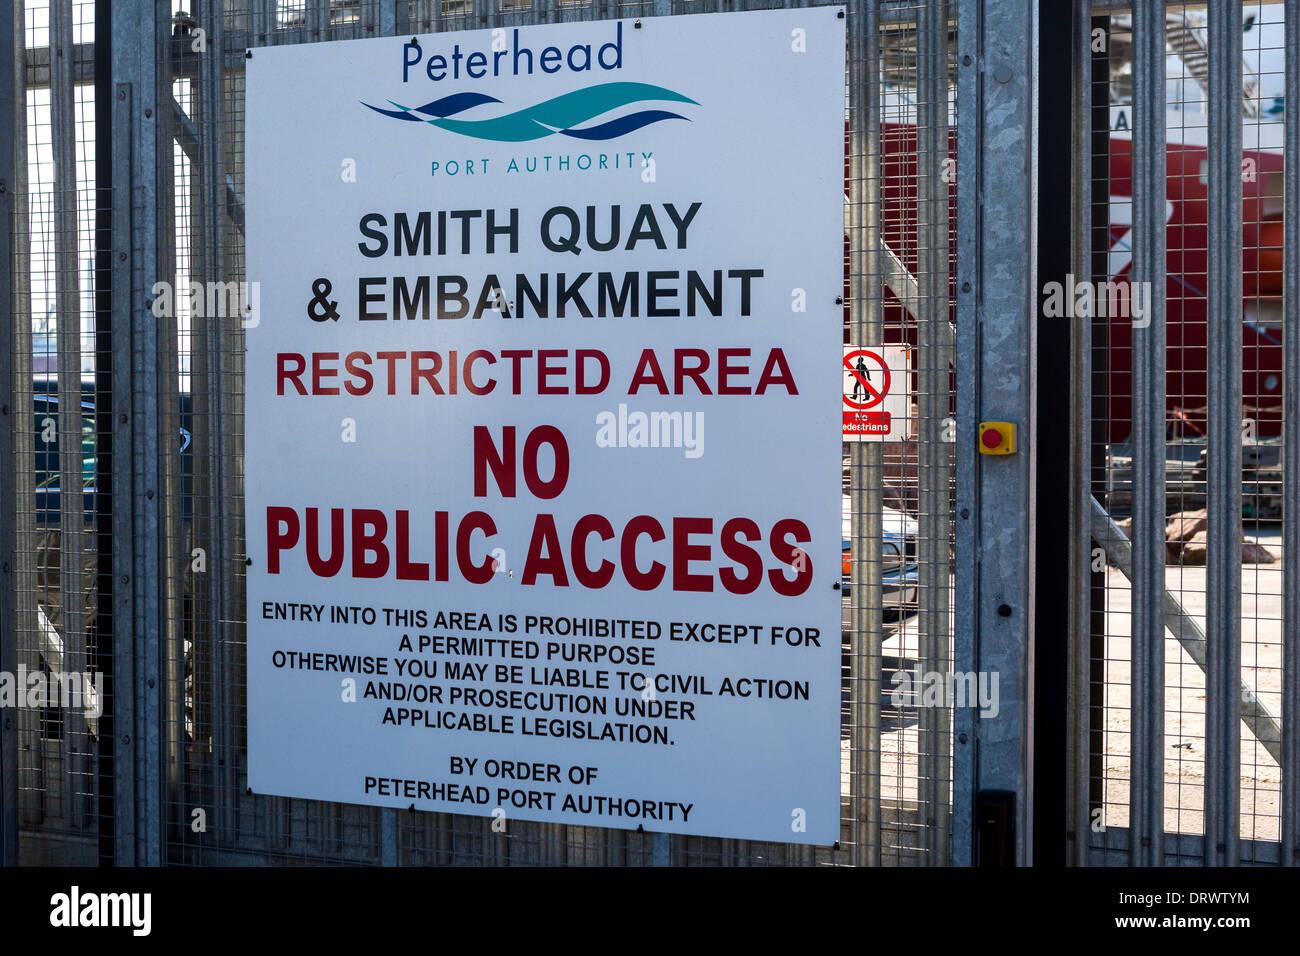 No public access sign. Peterhead Harbour Scotland - Stock Image